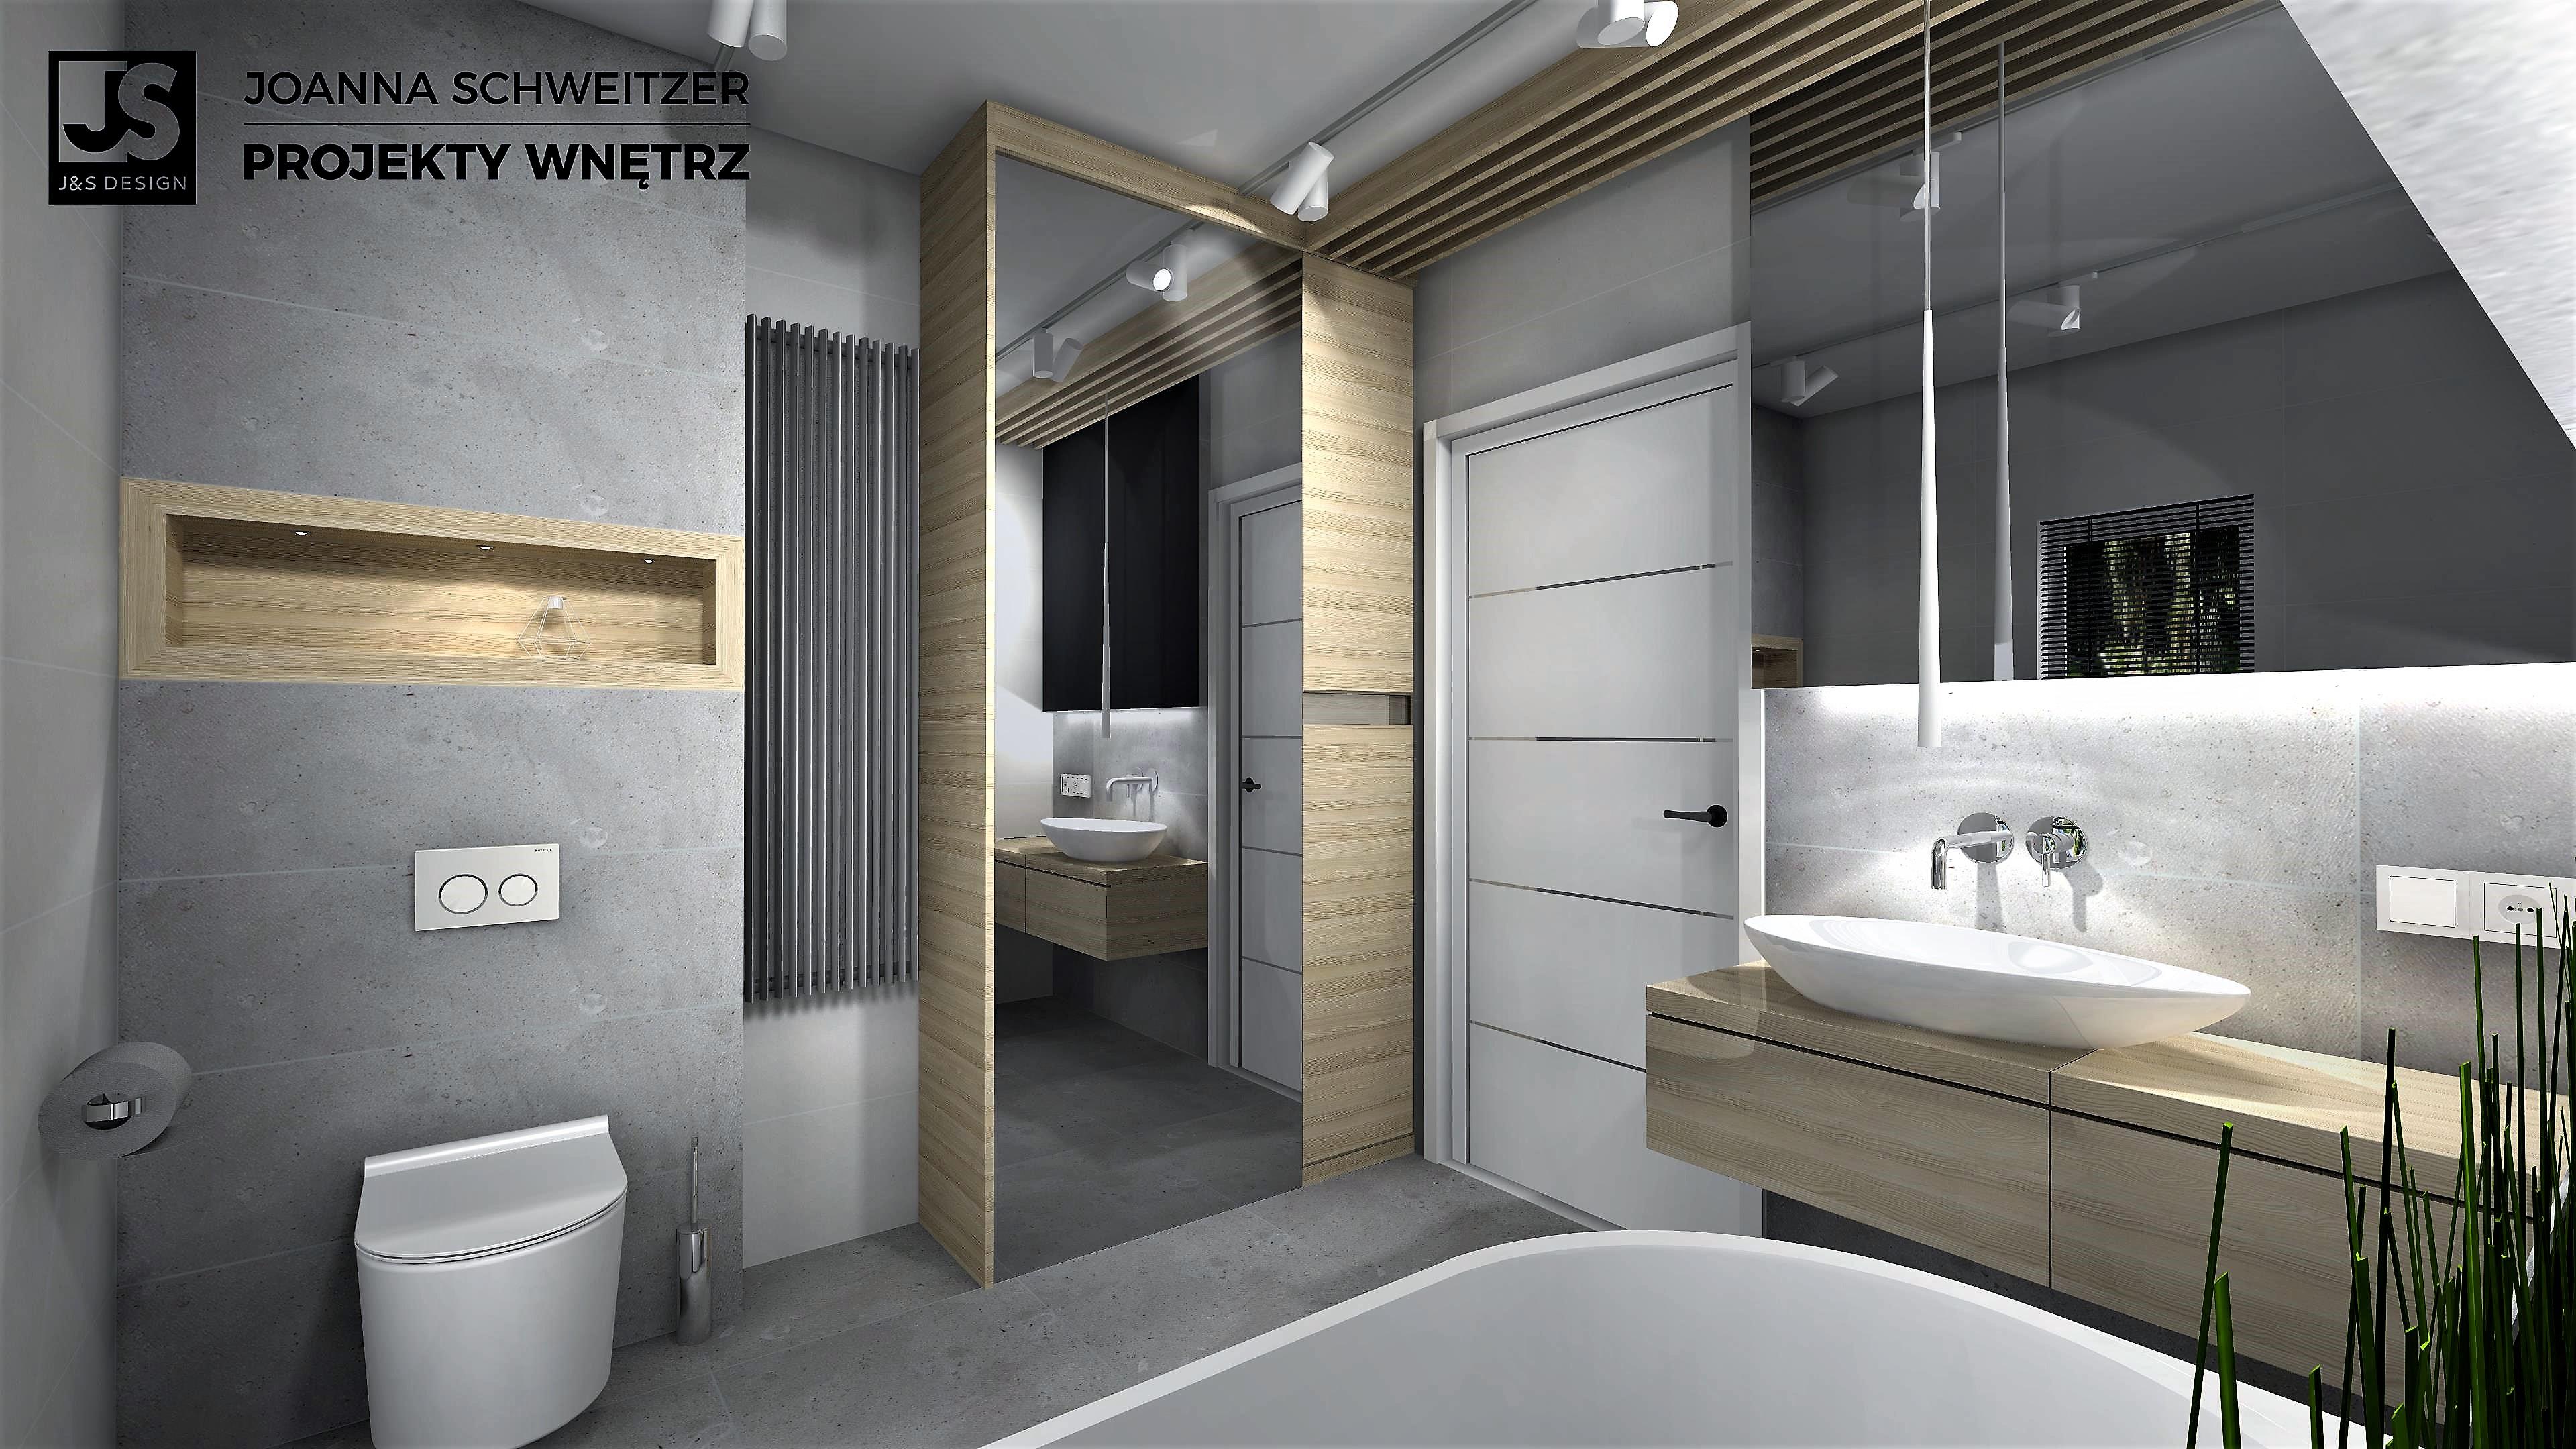 łazienka Beton Z Drewnem Js Design Joanna Schweitzer